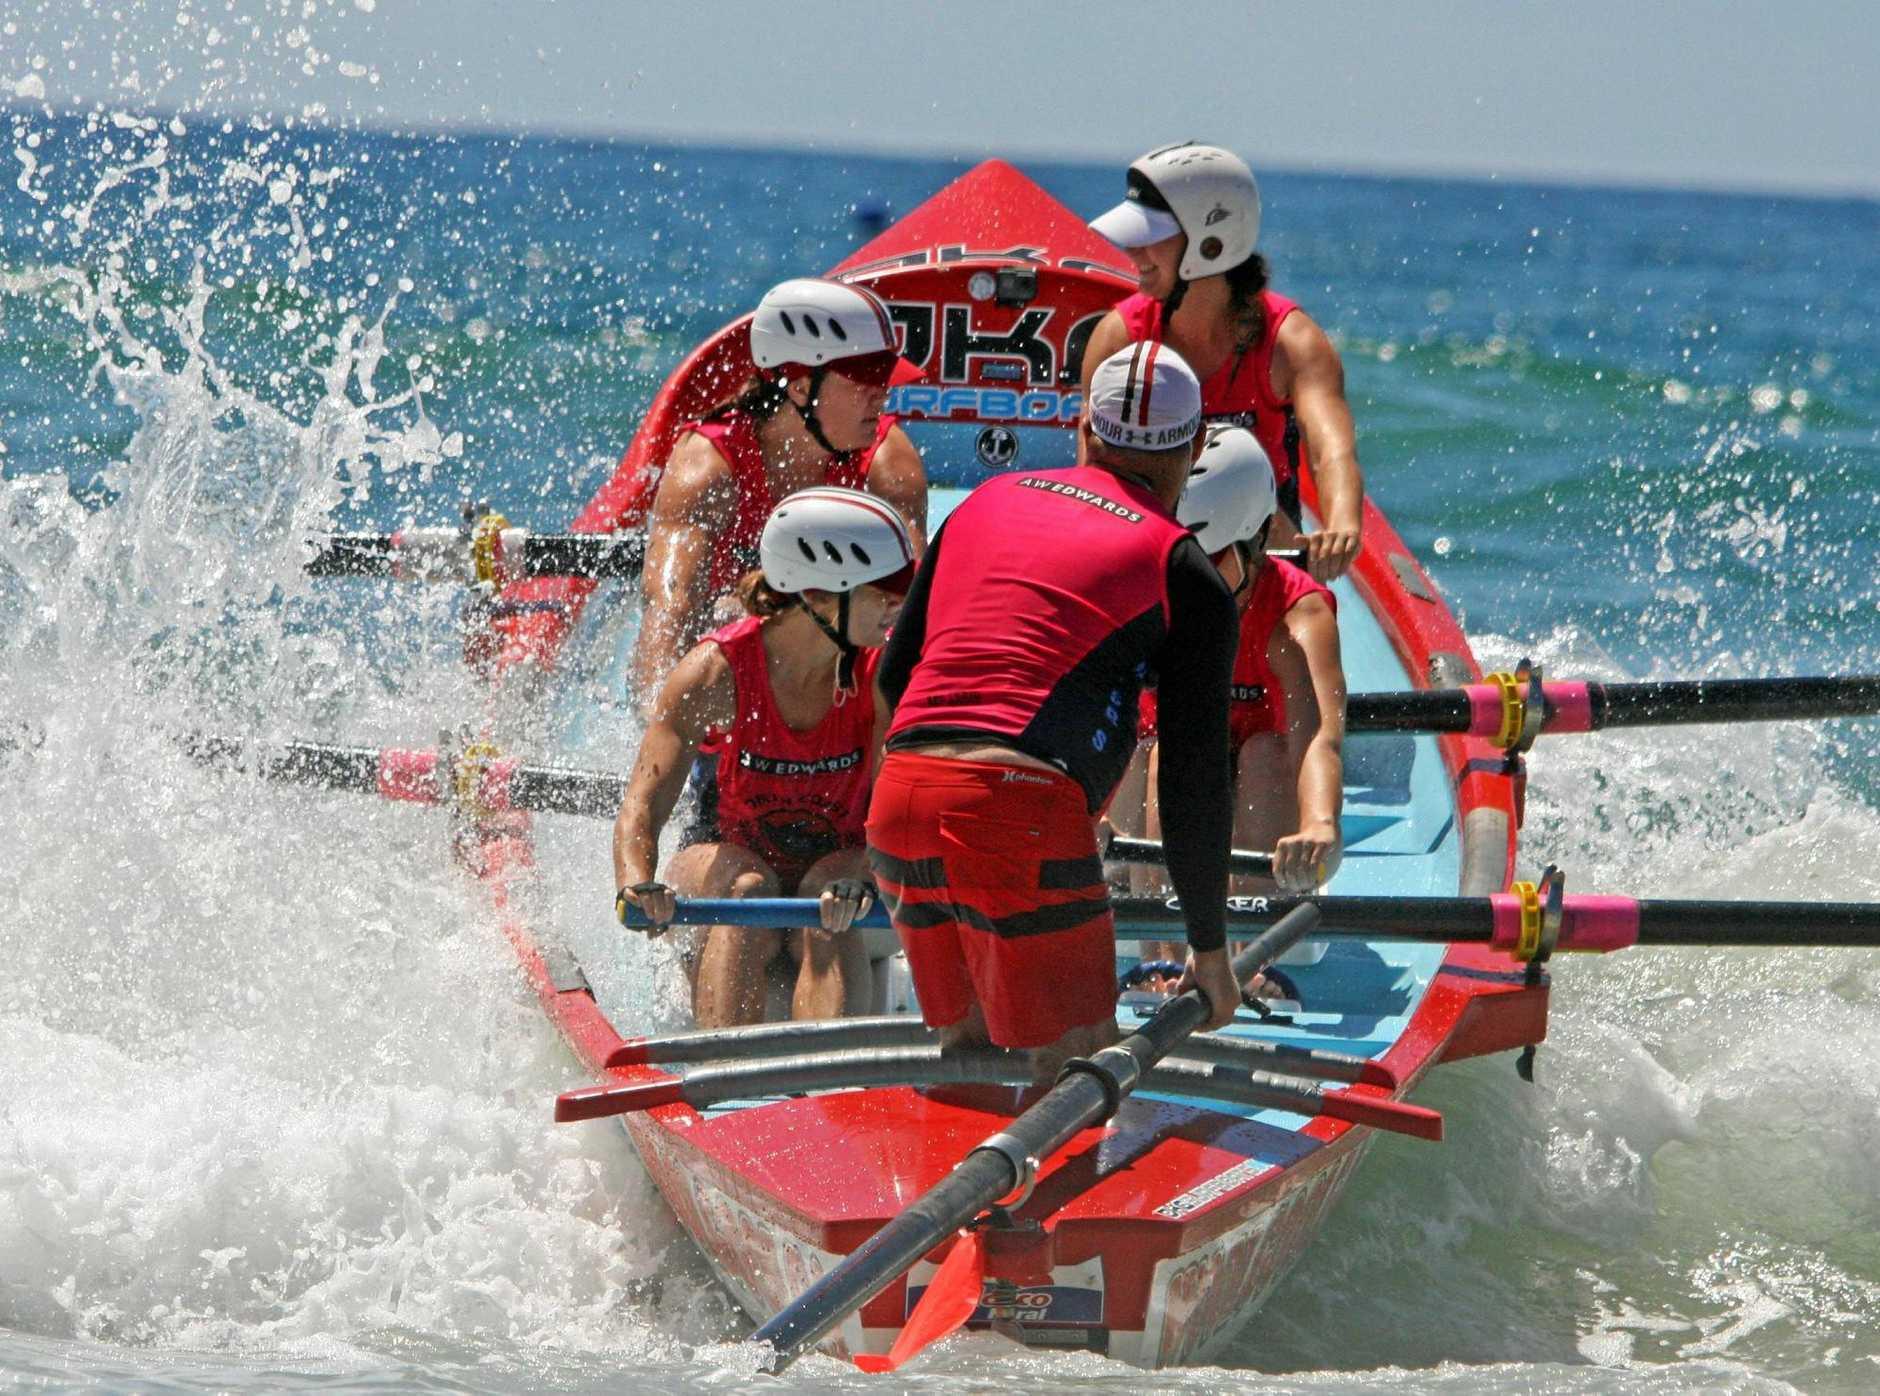 MAKING A SPLASH: Woolgoolga SLSC's surf boat crews performed strongly at the Australian Surf Life Saving Championships in Western Australia.